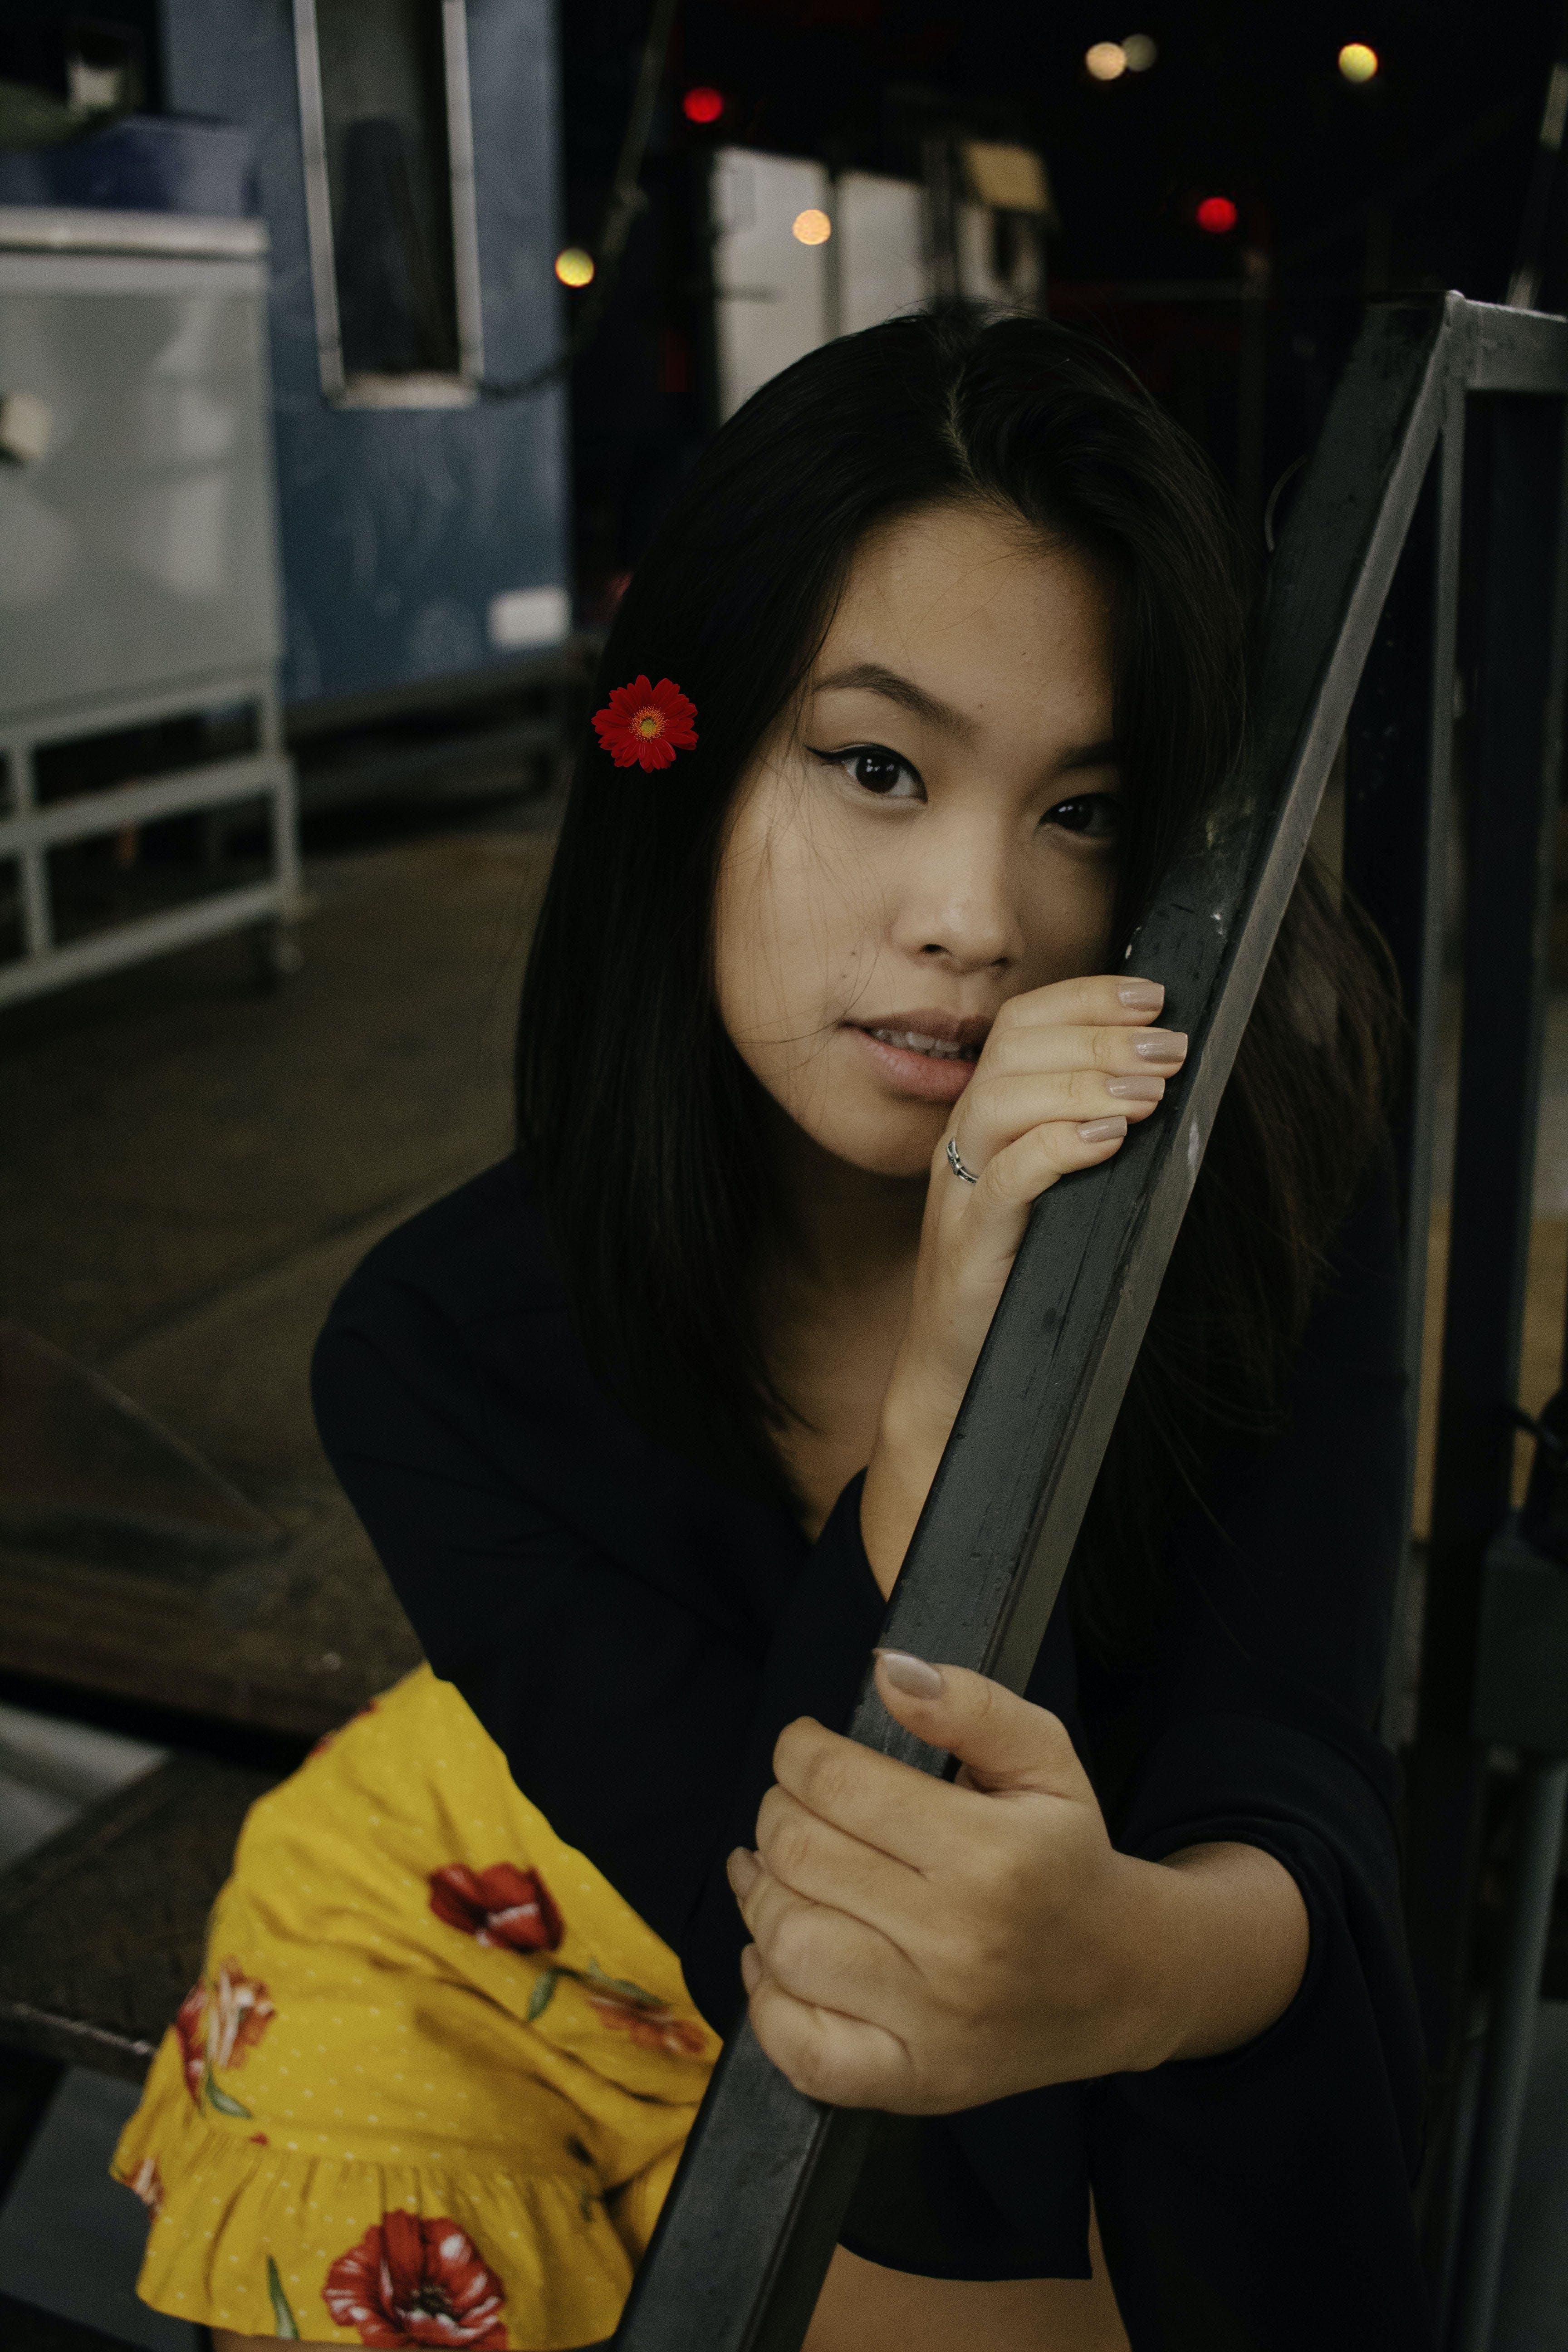 Woman Wearing Black Long-sleeved Shirt Holding Black Handrails